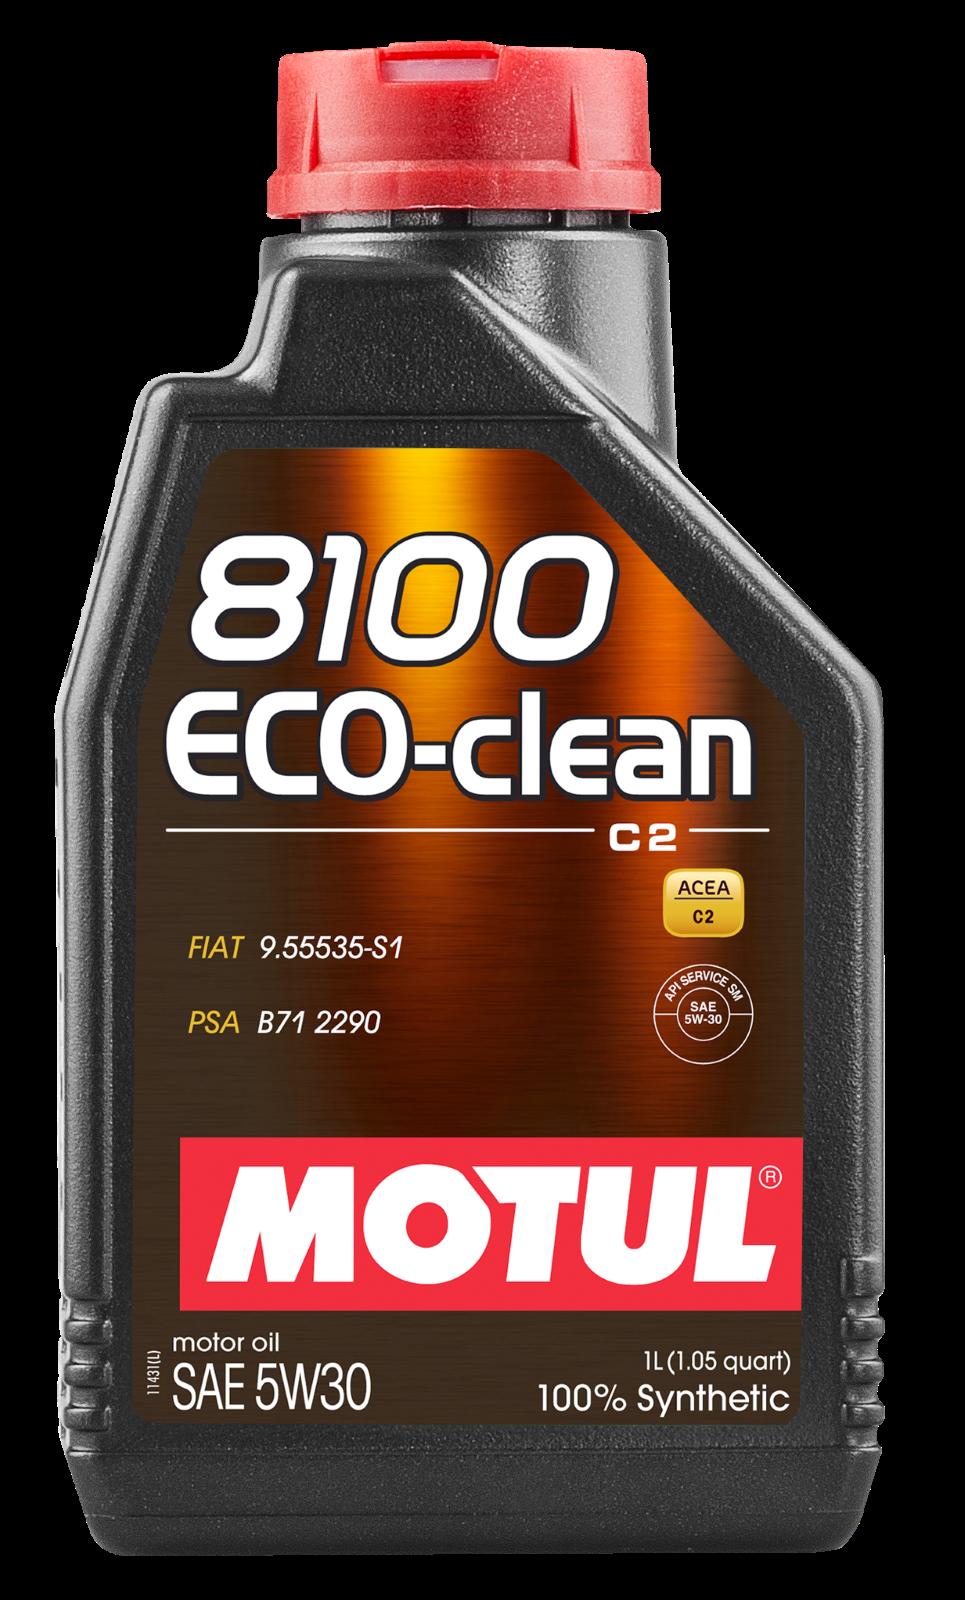 MOTUL AG MOTUL 8100 Eco-clean 5W-30 1L